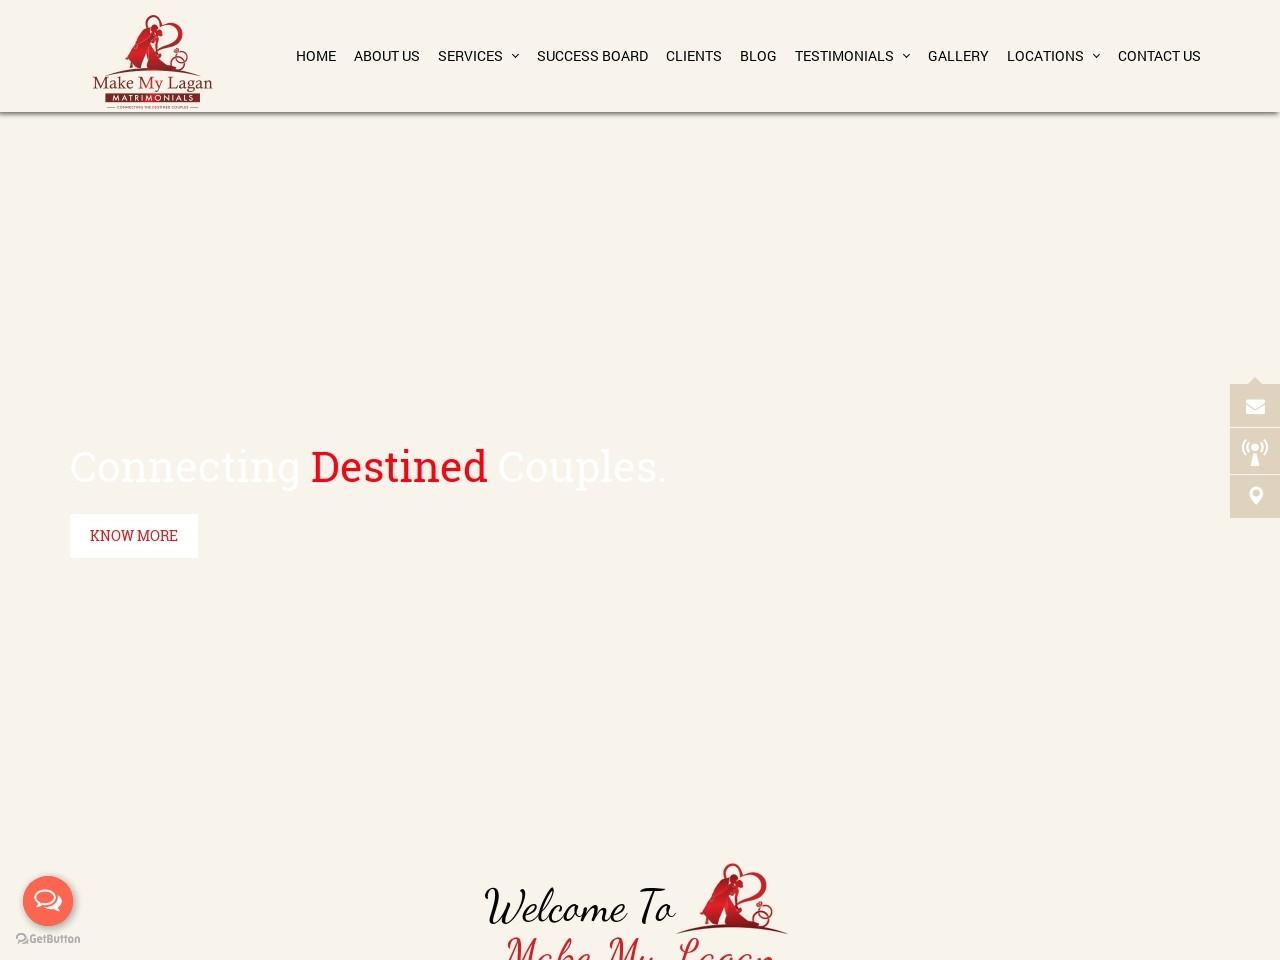 Personalized Matrimonial- MakeMyLagan's Forte